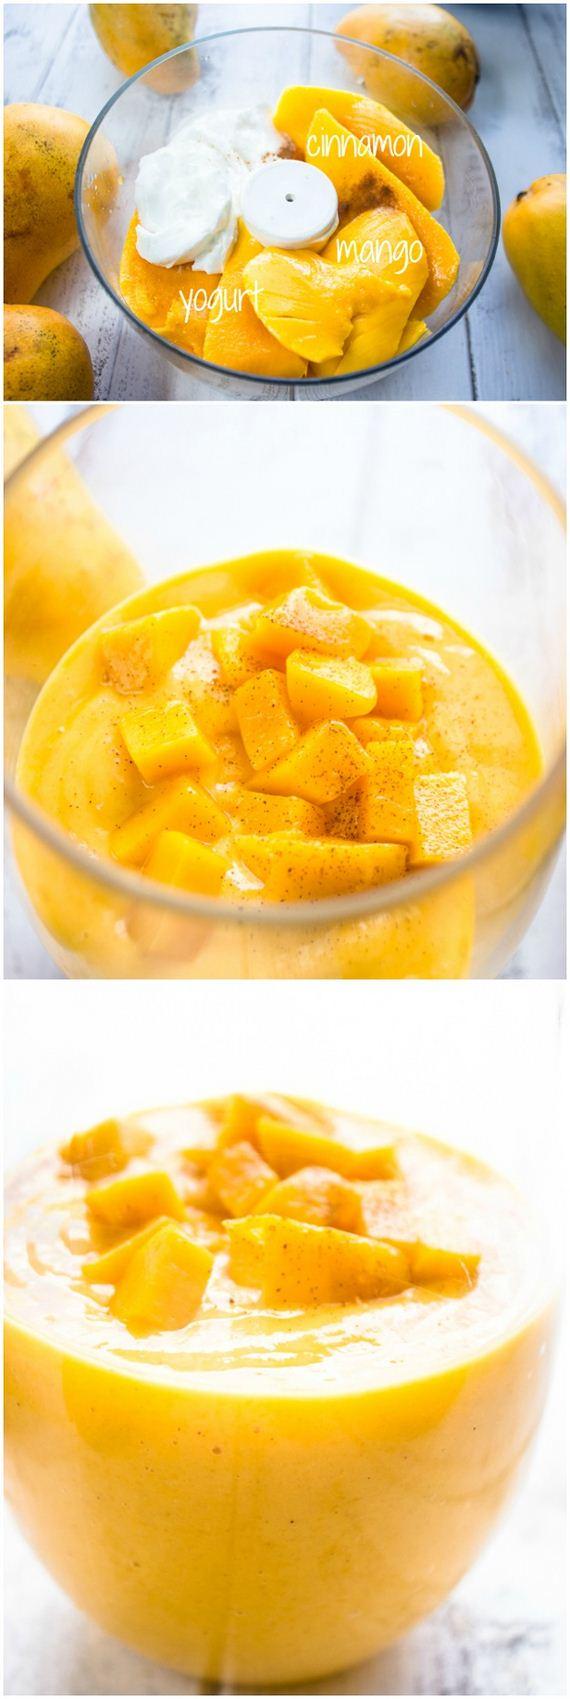 04-healthy_smoothie_recipes